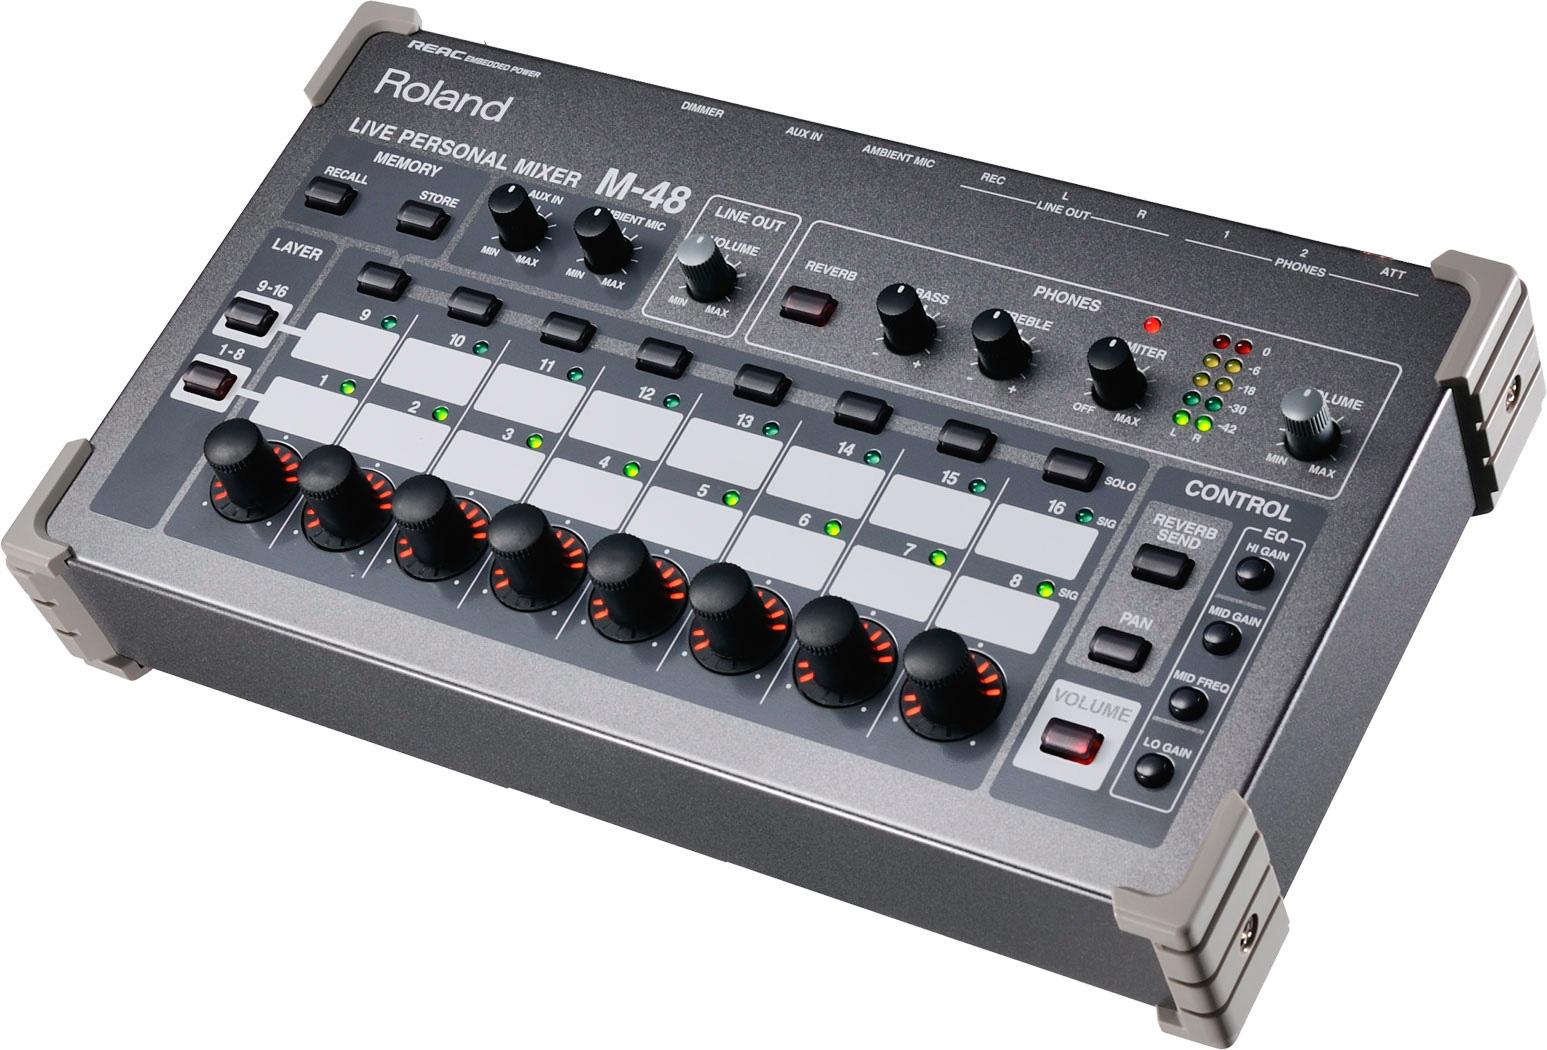 Roland M48 43 Input Live Personal Mixer